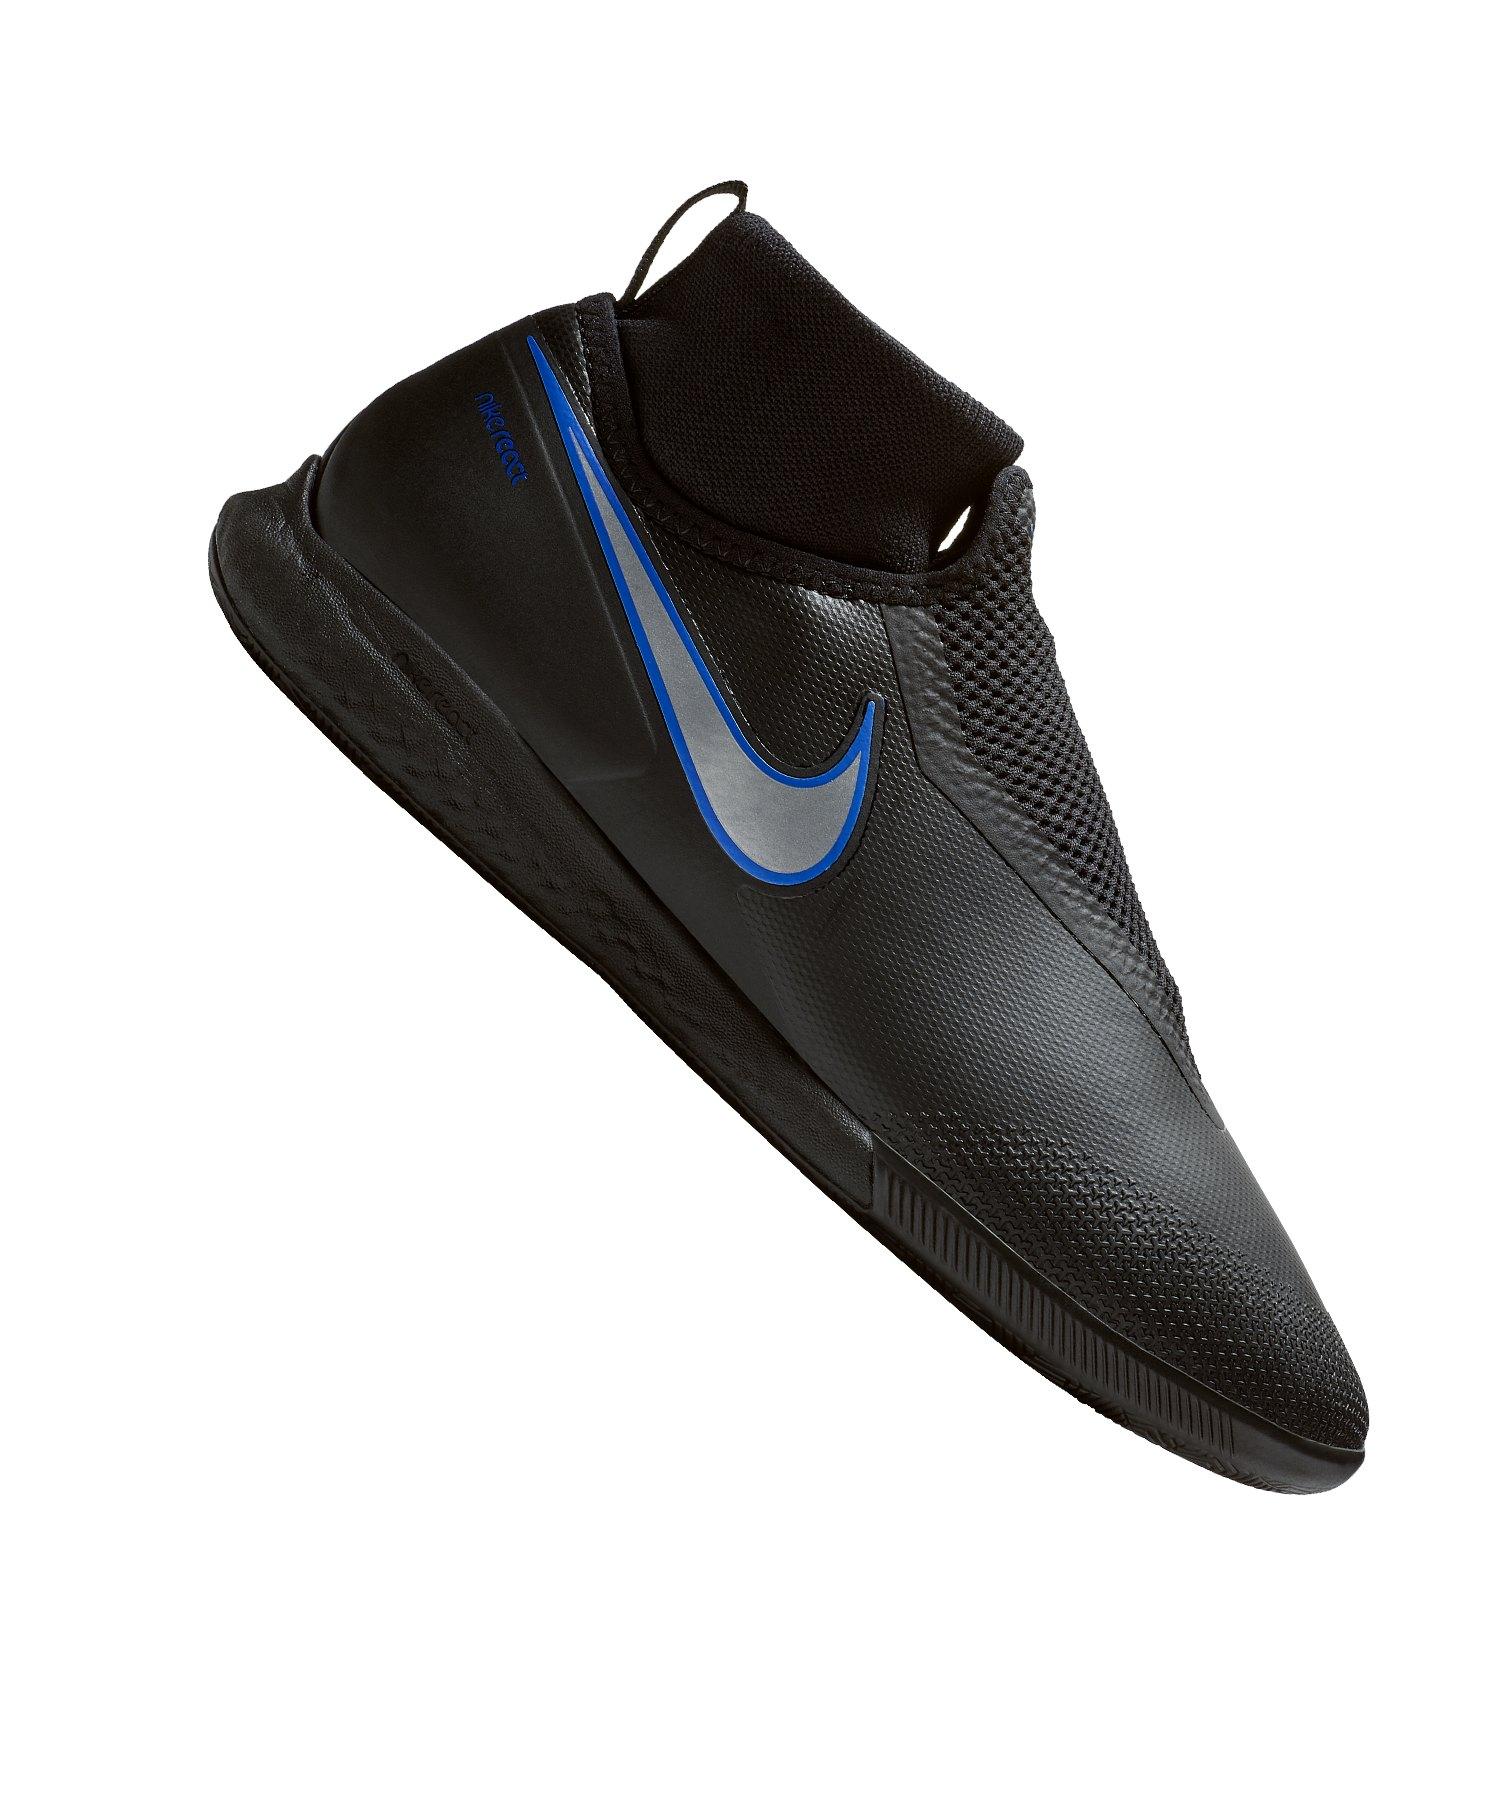 ec51bfe3595 Nike Phantom Vision React Pro IC Schwarz F004 - schwarz